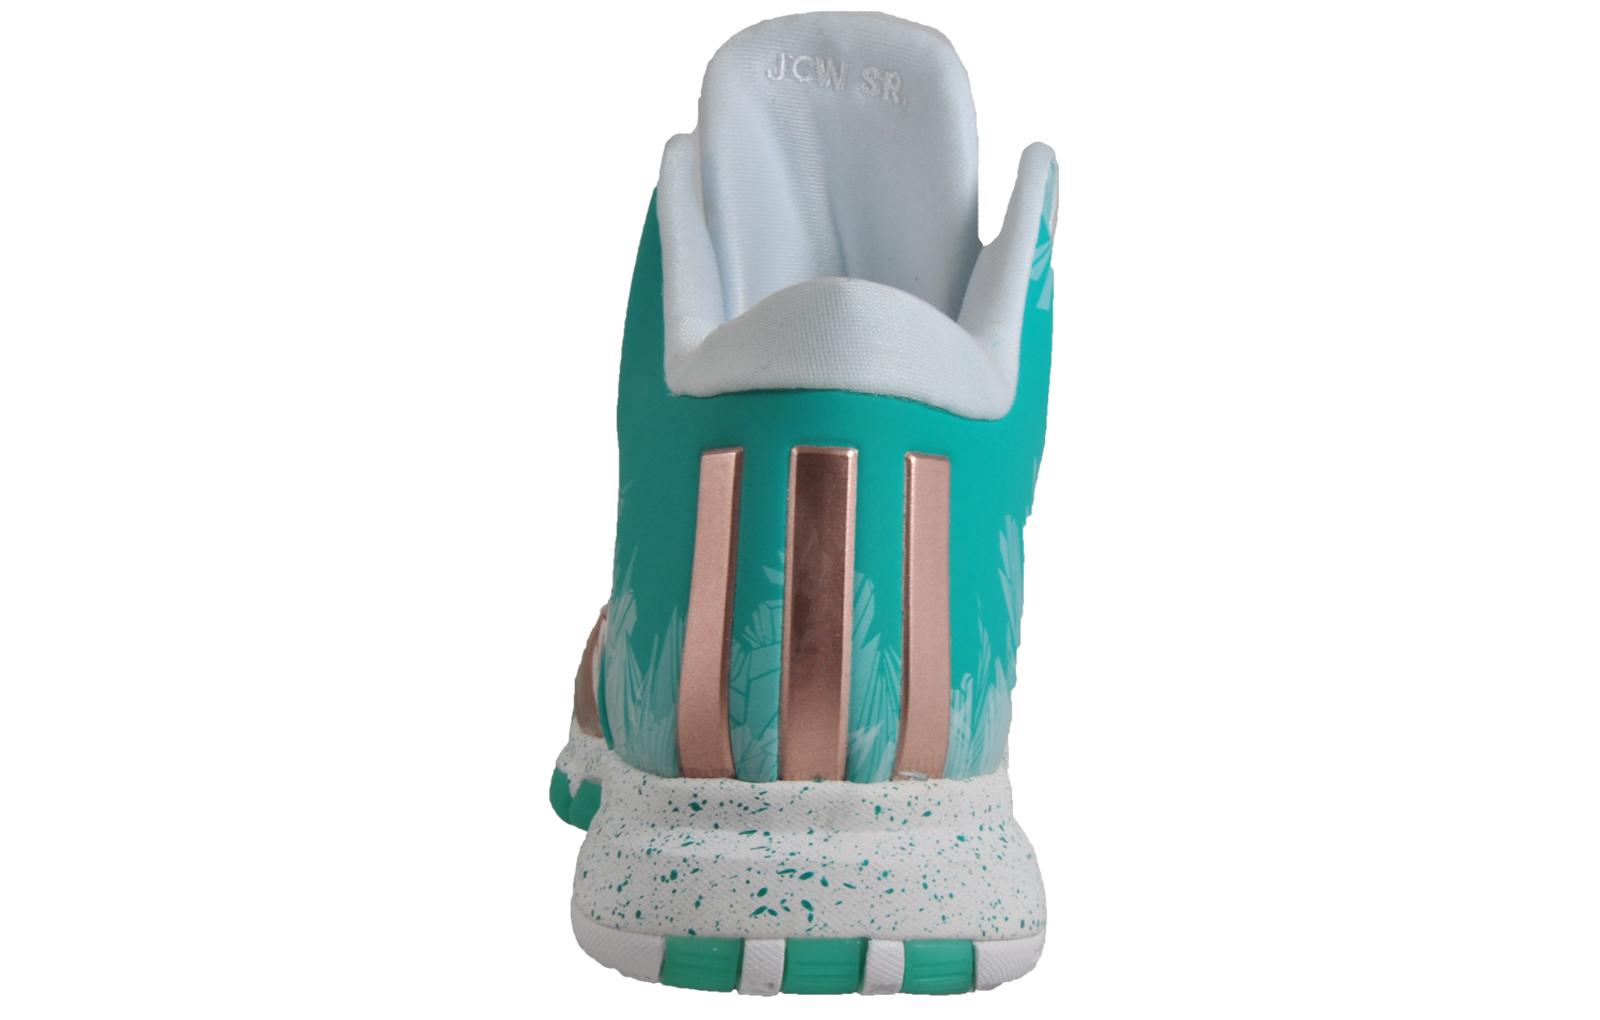 best website ca144 e9873 Adidas John Wall 2 Limited Edition Premium Mens Basketball Trainers Green